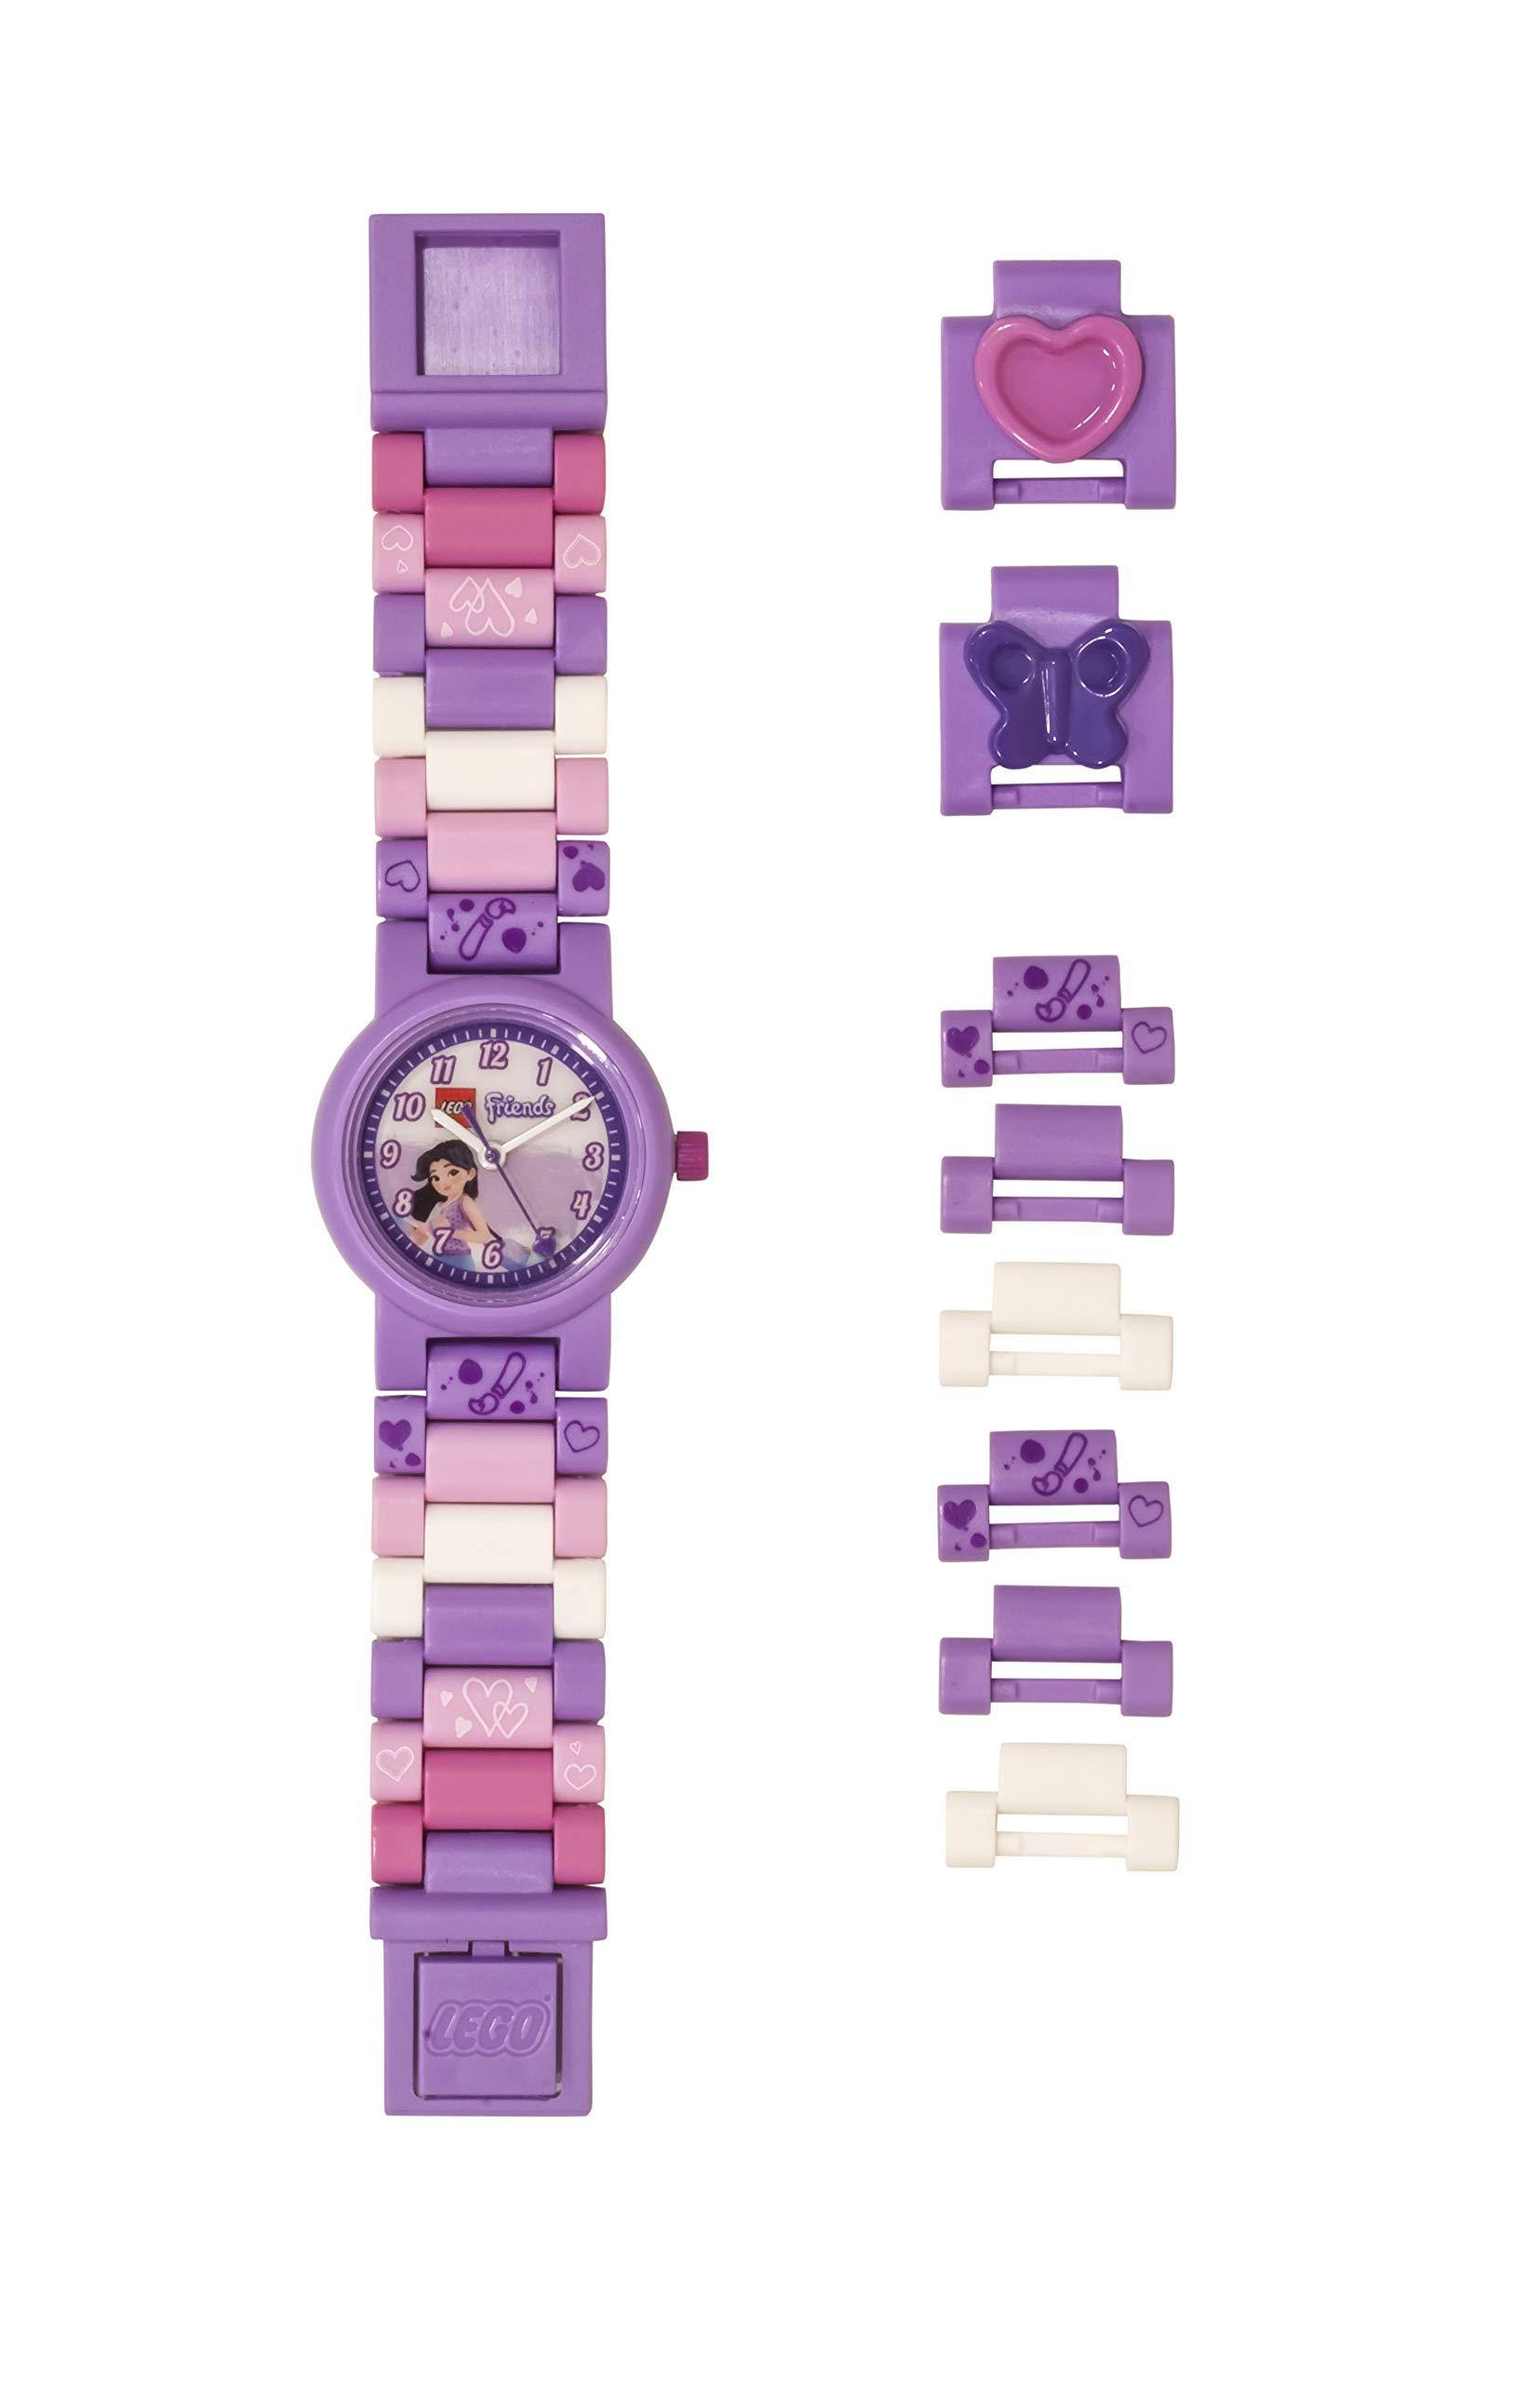 Lego Friends 8021223 Emma Kids Buildable Watch with Link Bracelet | Purple/White | Plastic | 25mm case Diameter| Analog Quartz | boy Girl | Official by ClicTime